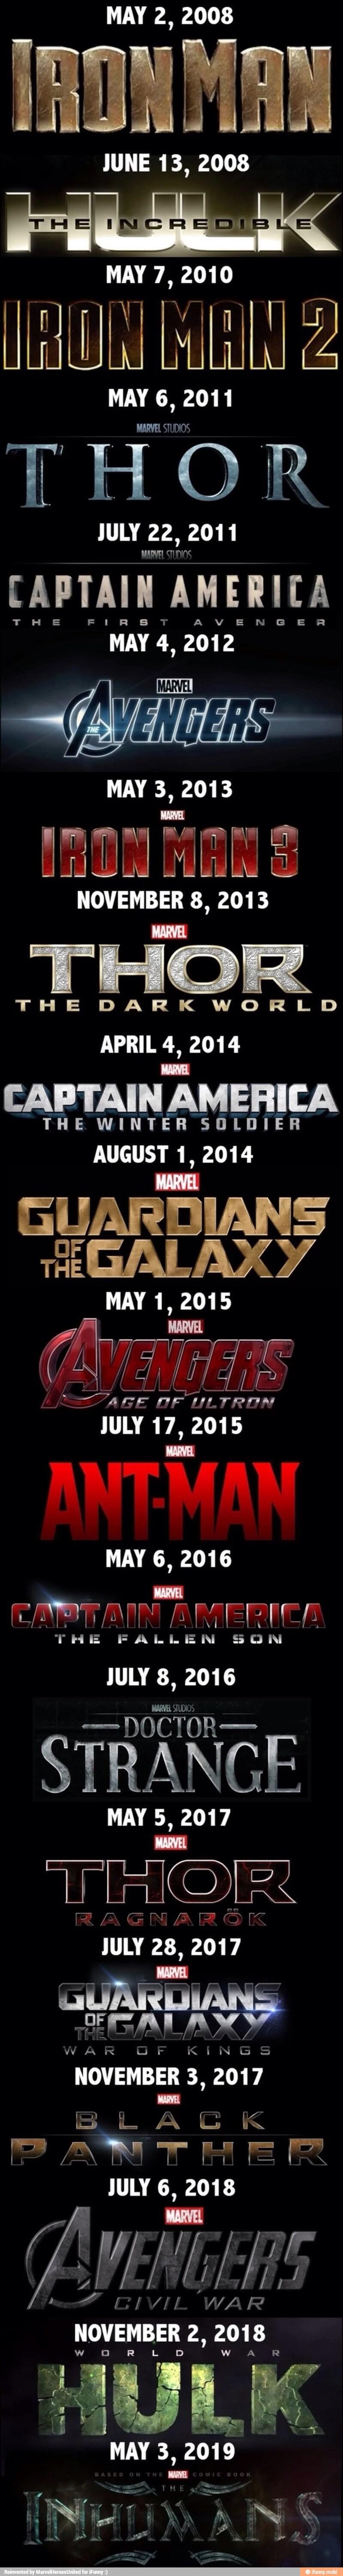 Marvel Cinematic Universe Release Dates